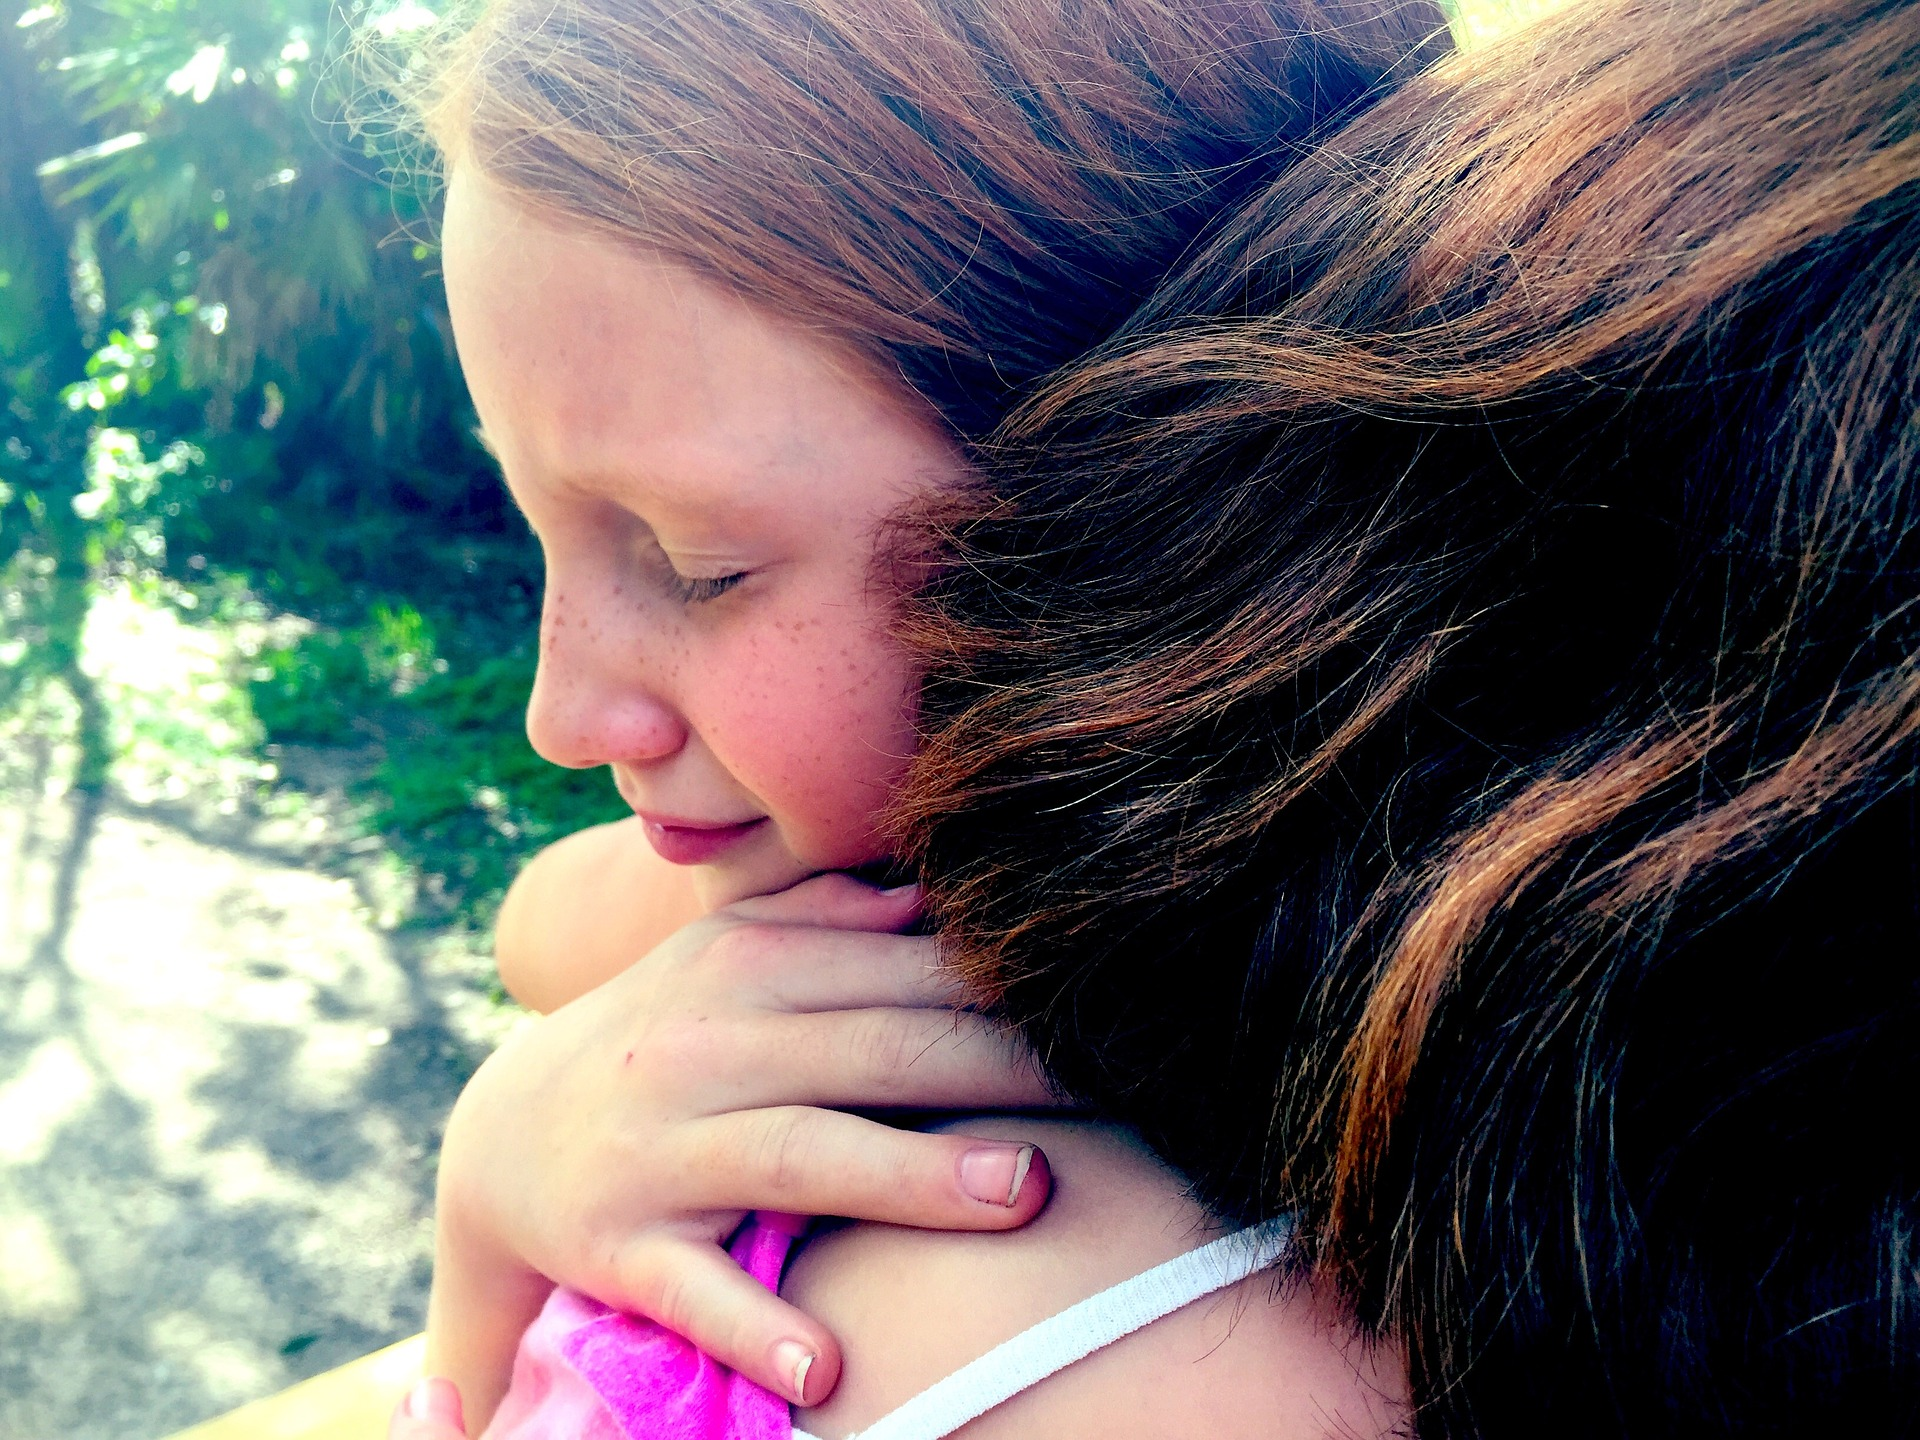 Girls hugging emotionally